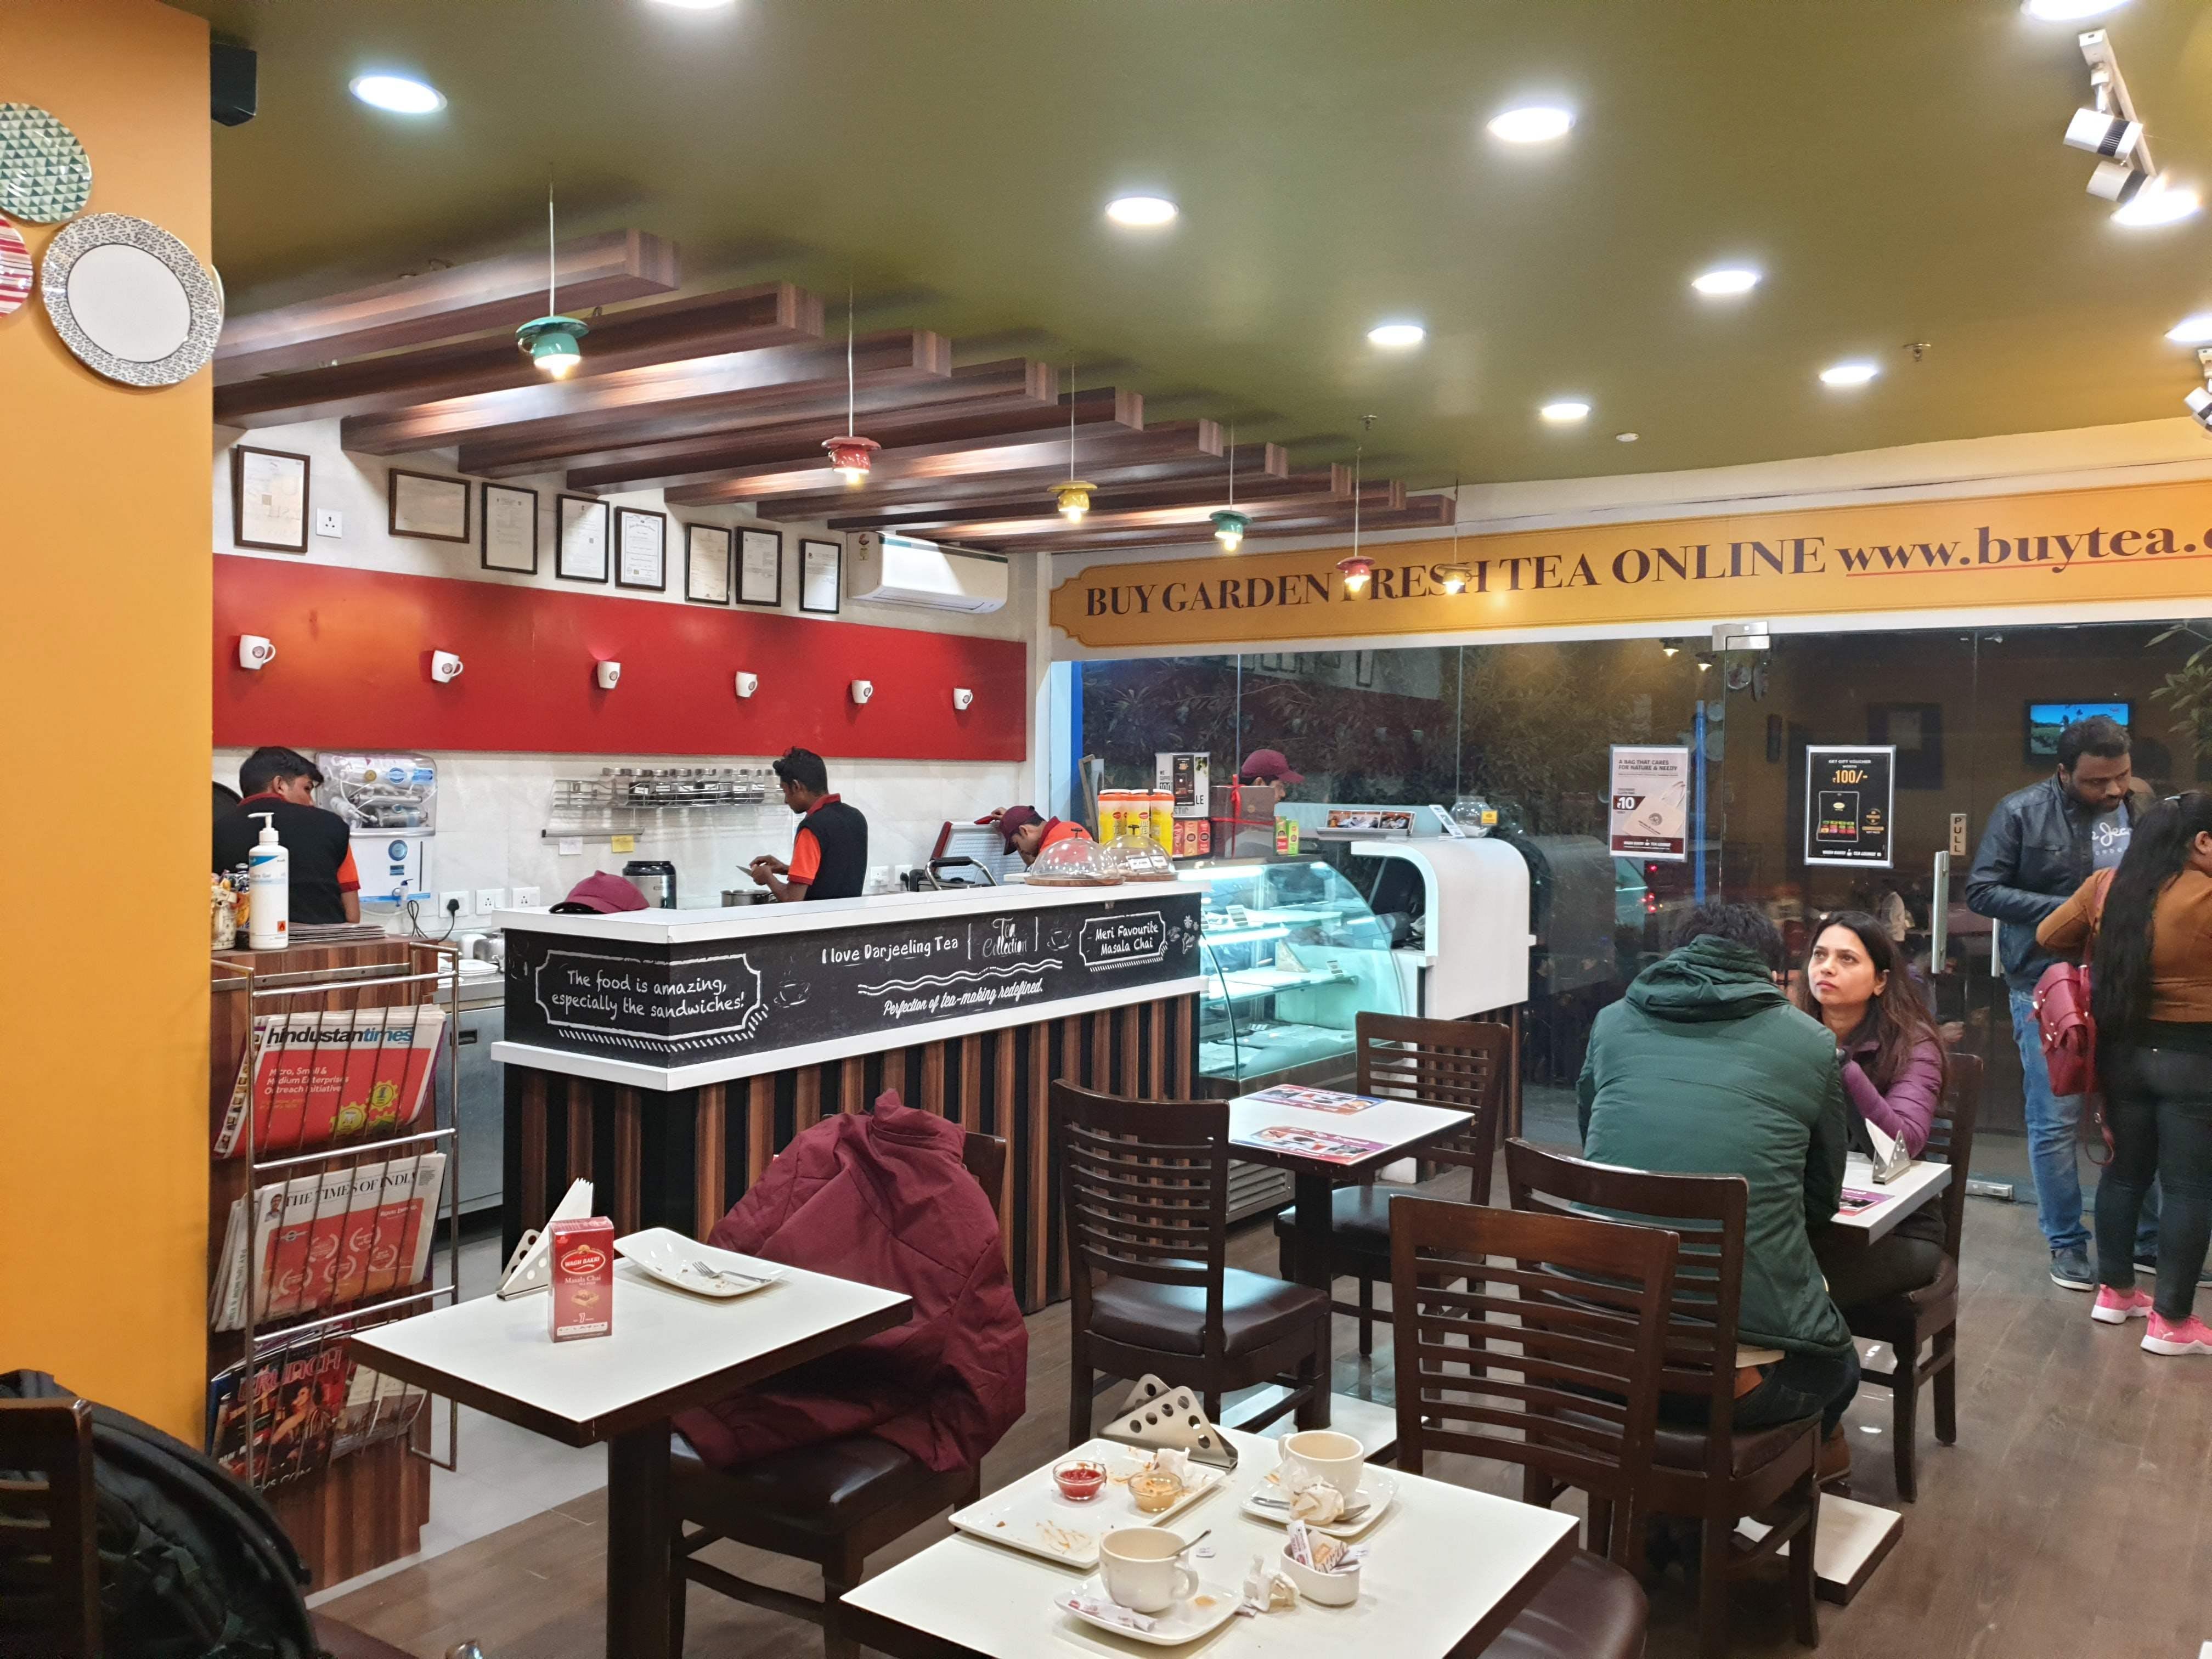 Building,Interior design,Restaurant,Outlet store,Customer,Food court,Retail,Fast food restaurant